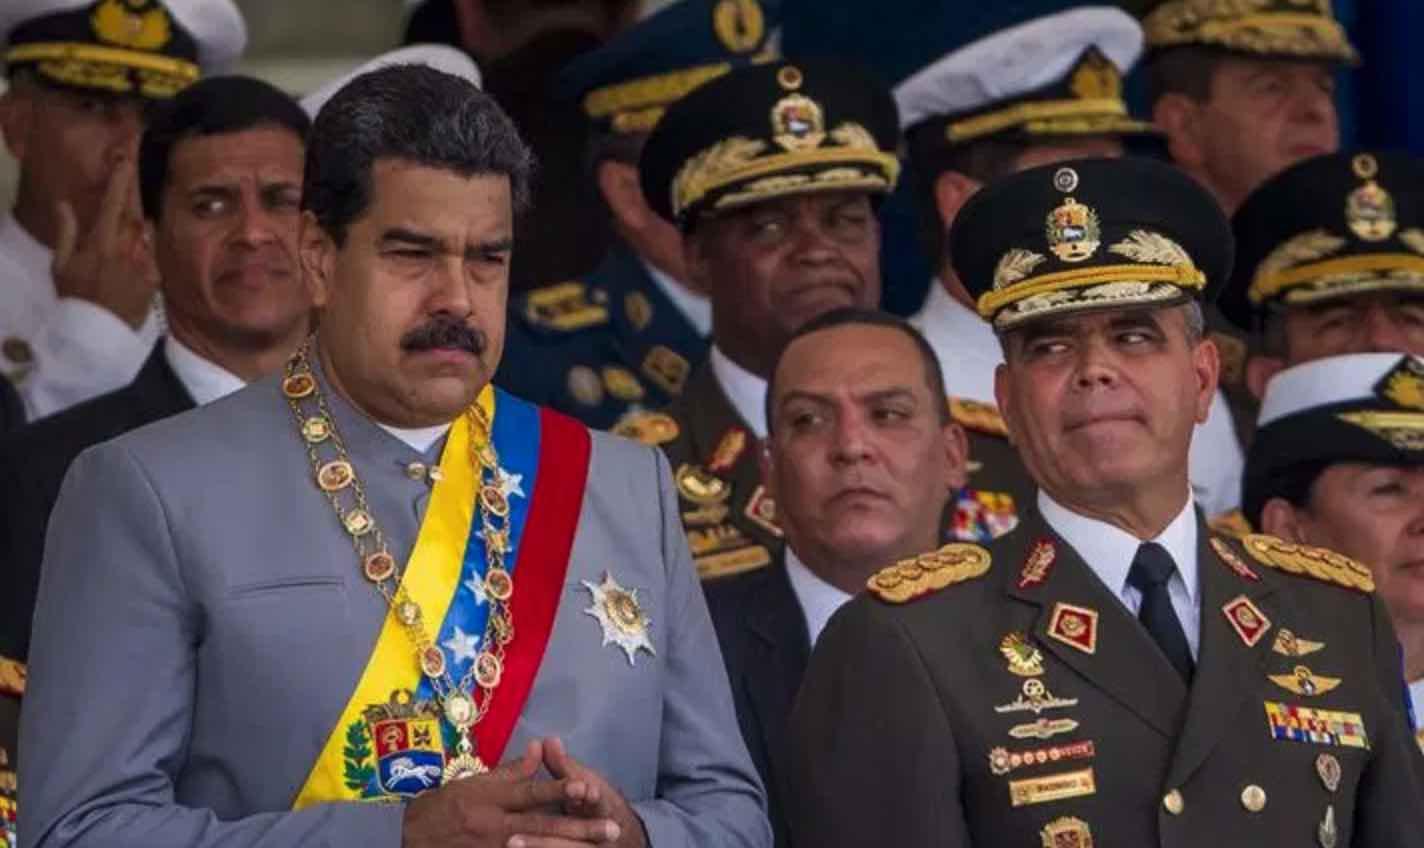 Nicolás Maduro y Vladimir Padrino, Dictadura venezolana